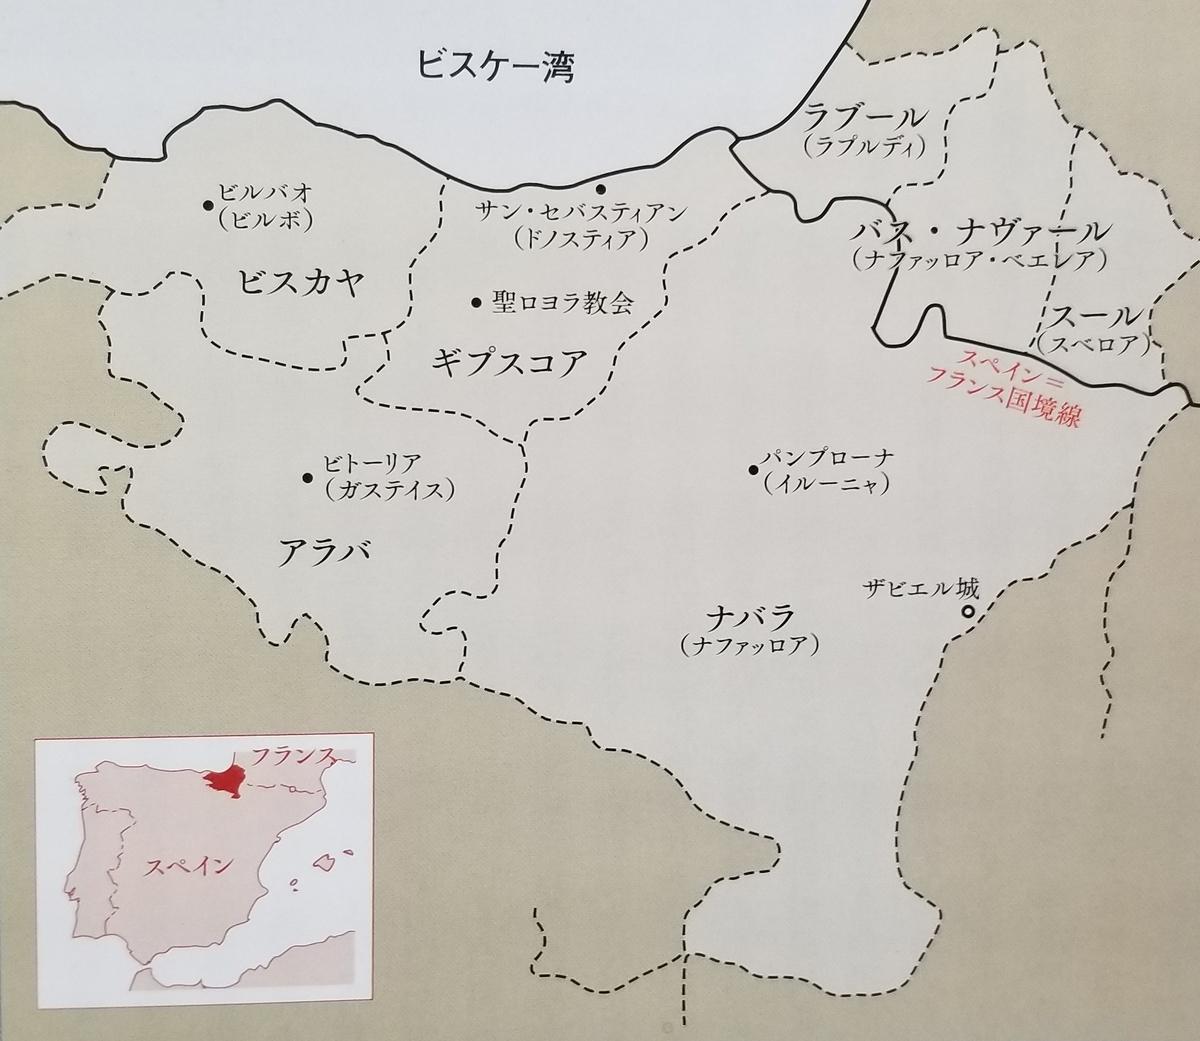 f:id:akashiaya:20201108134804j:plain